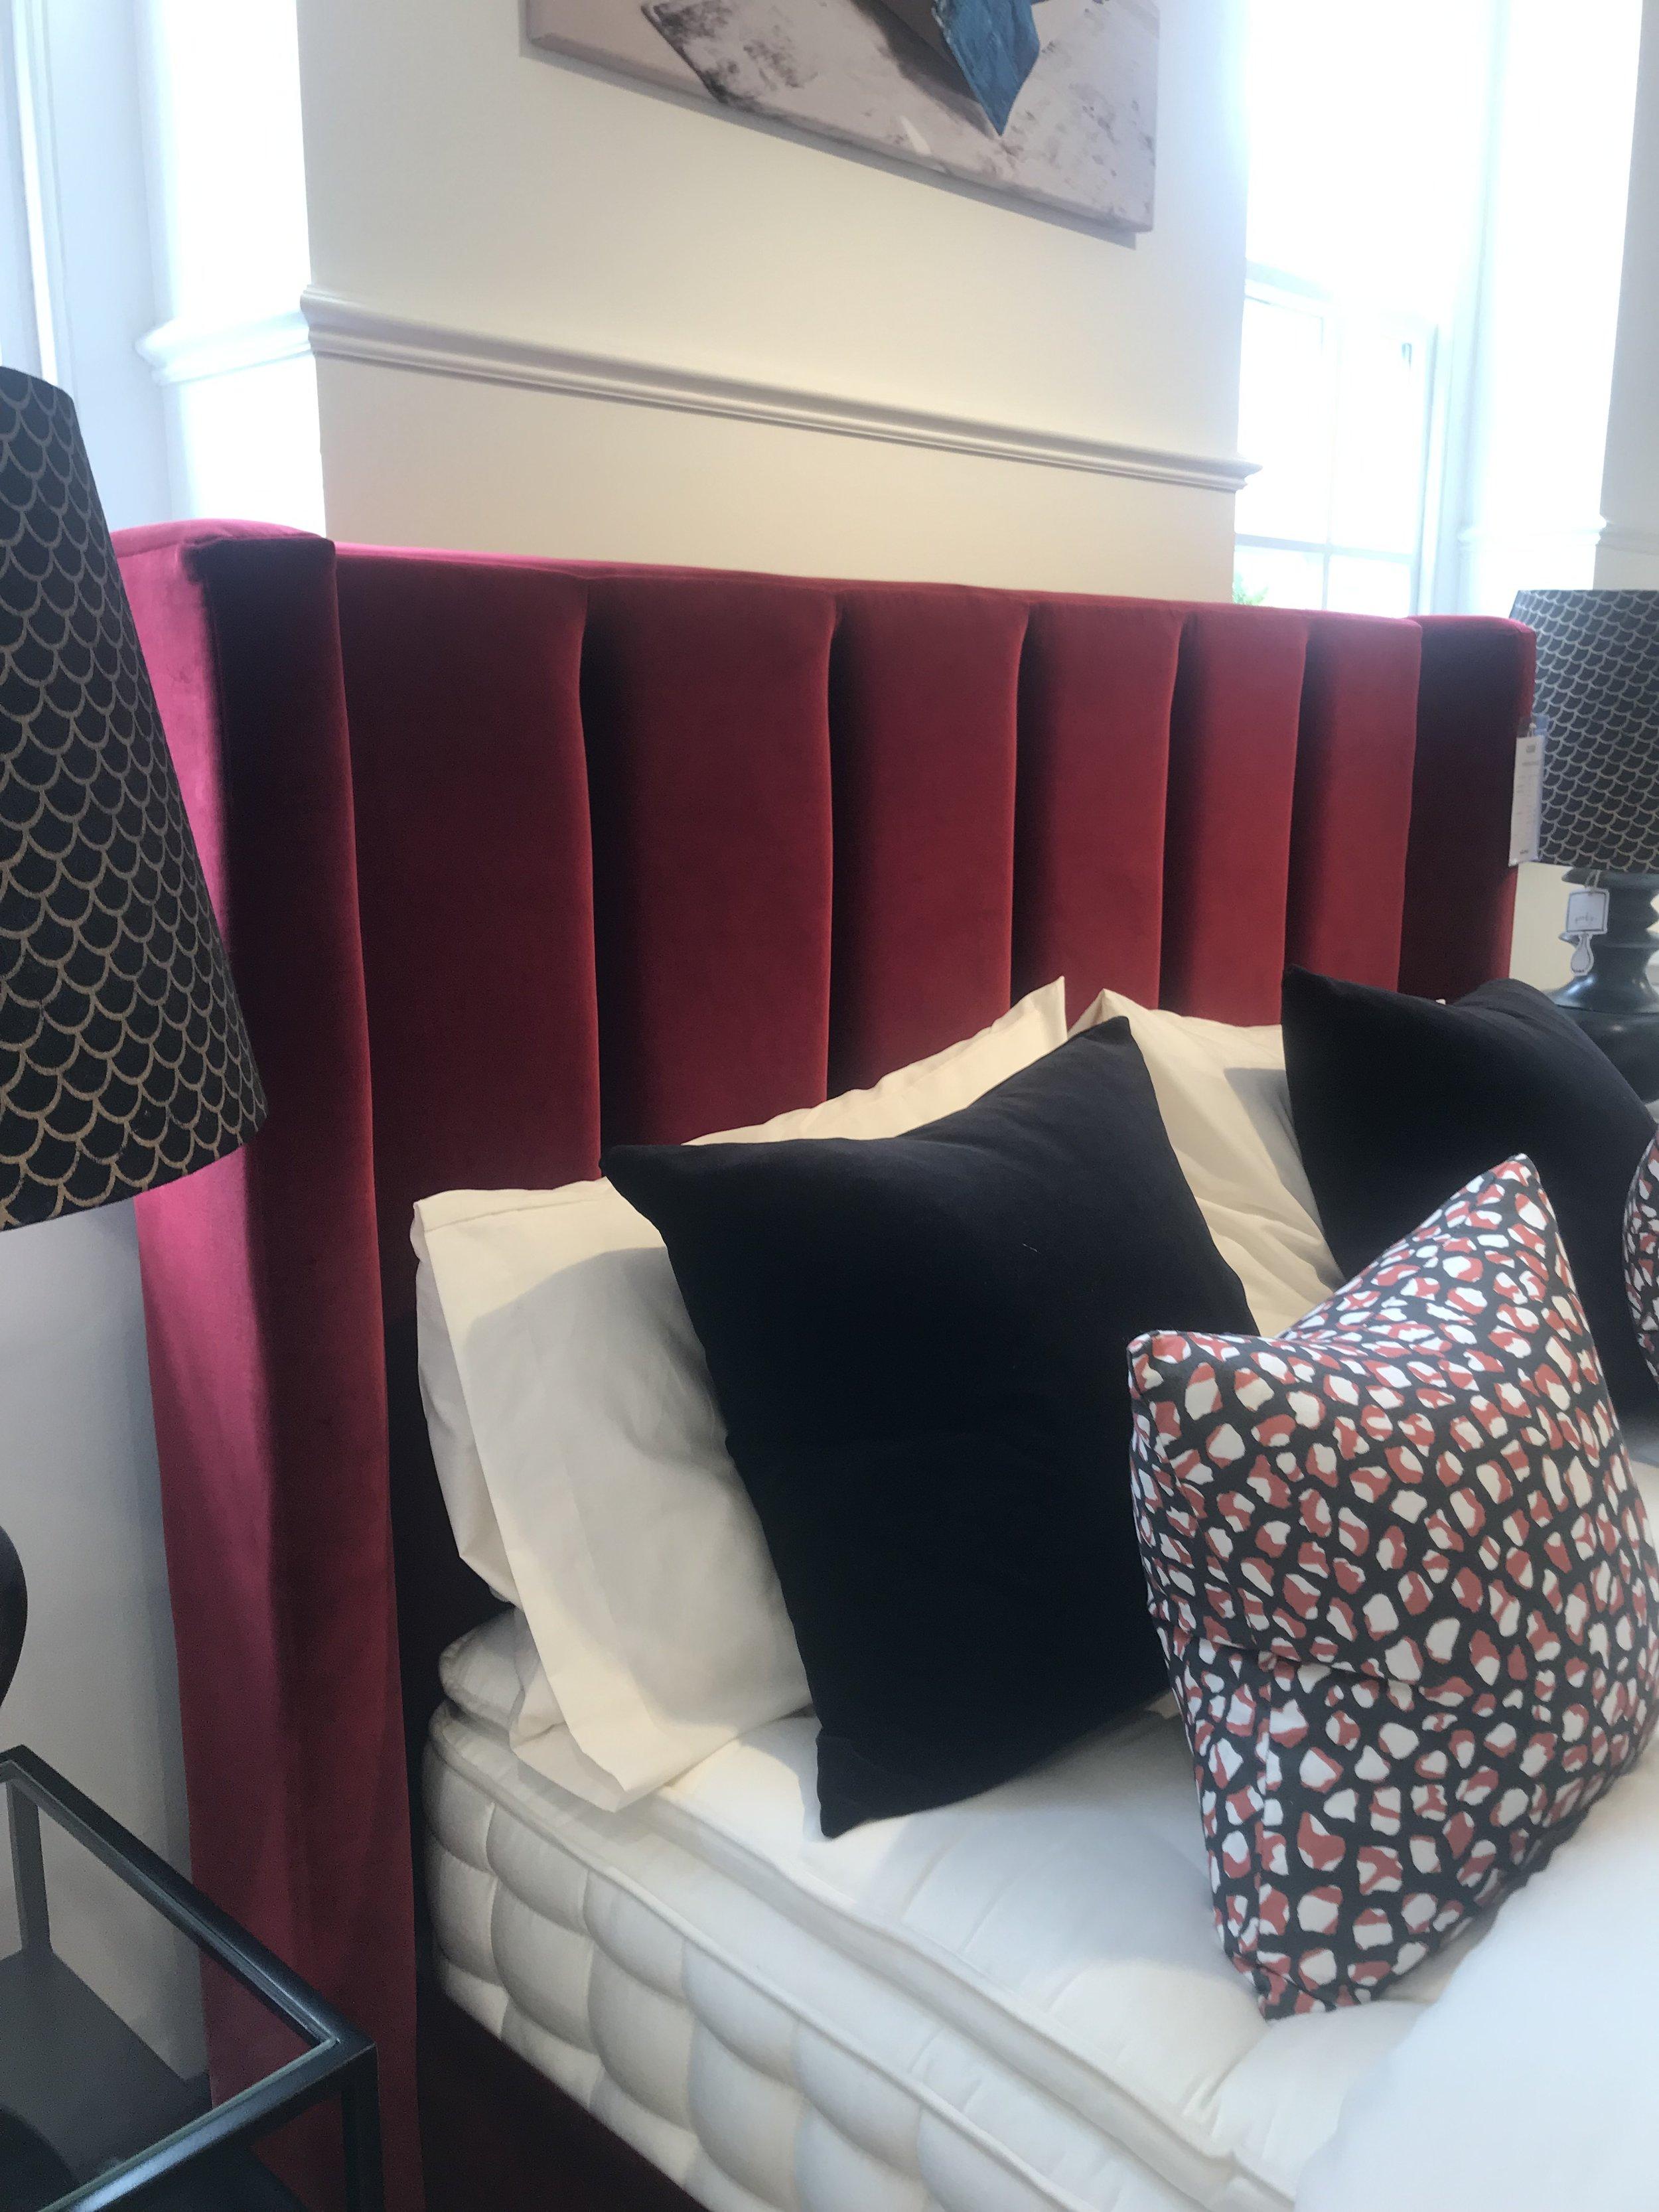 The beautiful  Cleo bed in Claret velvet